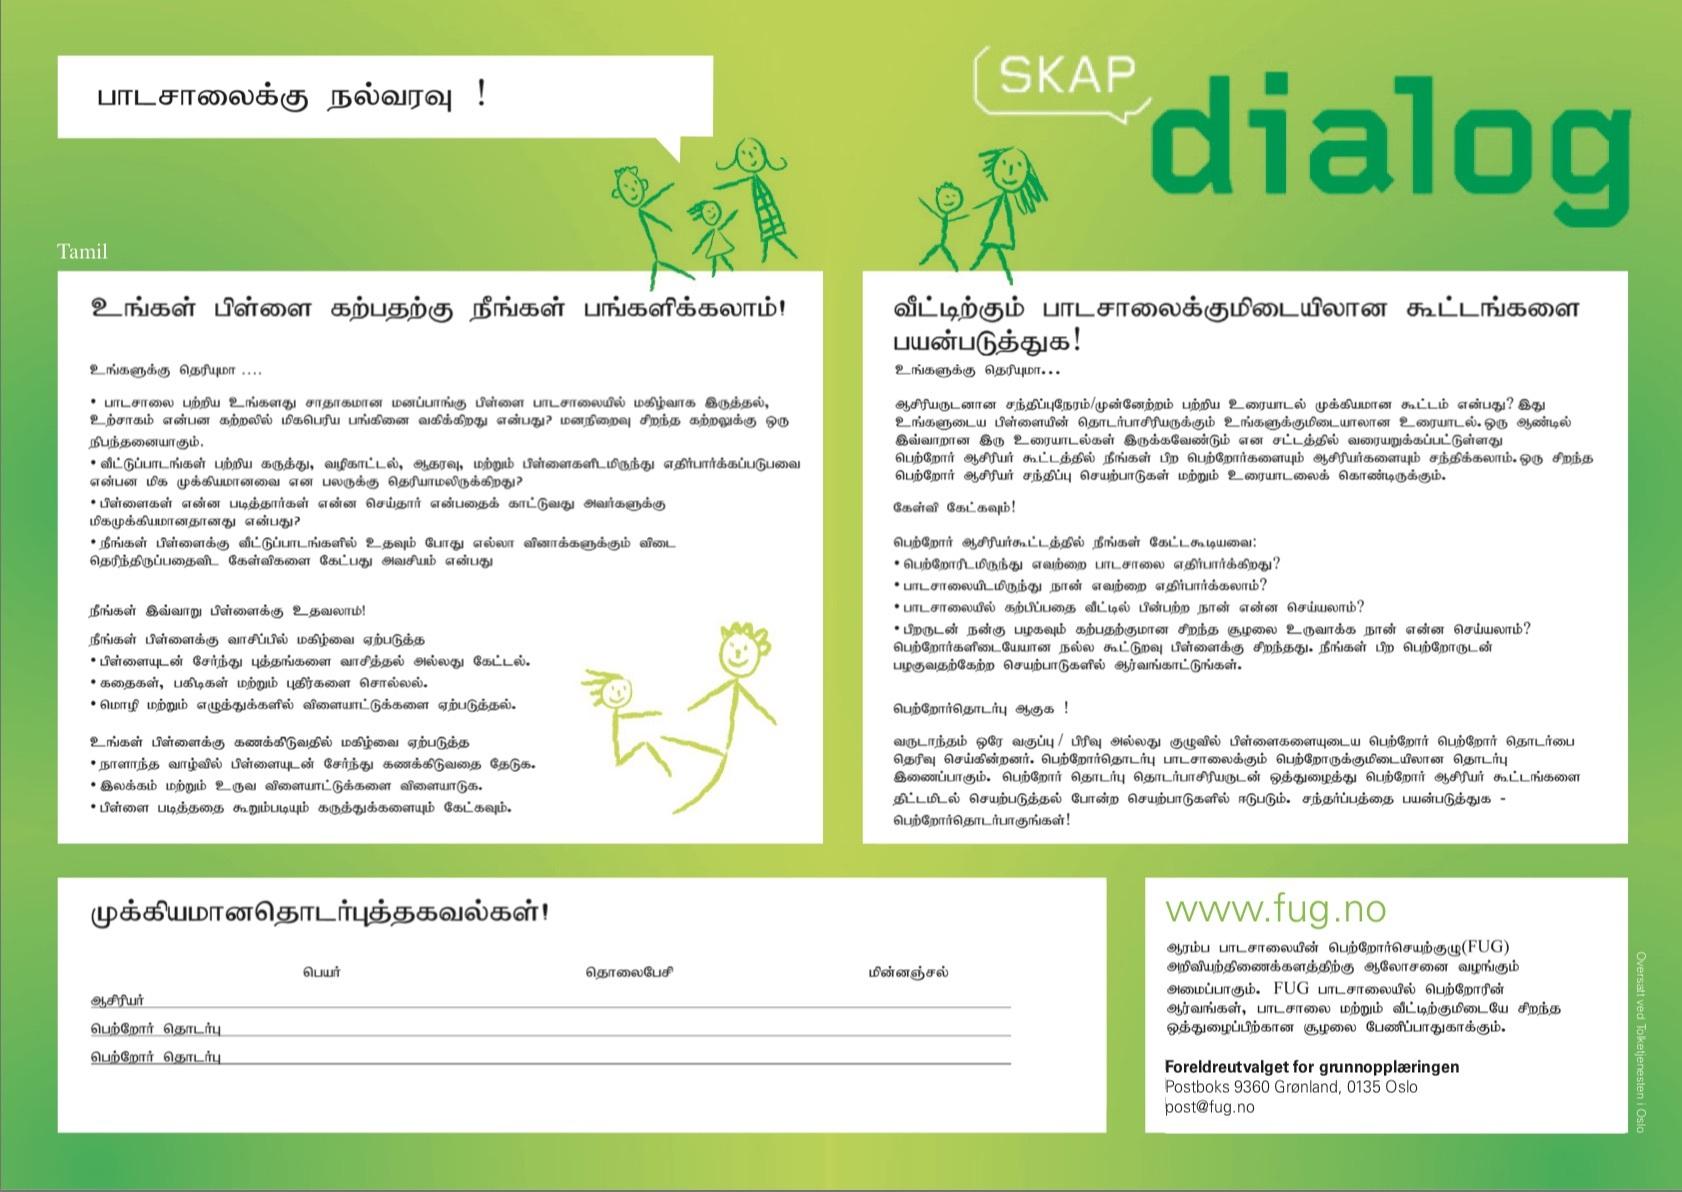 Skap dialog 1 tamil